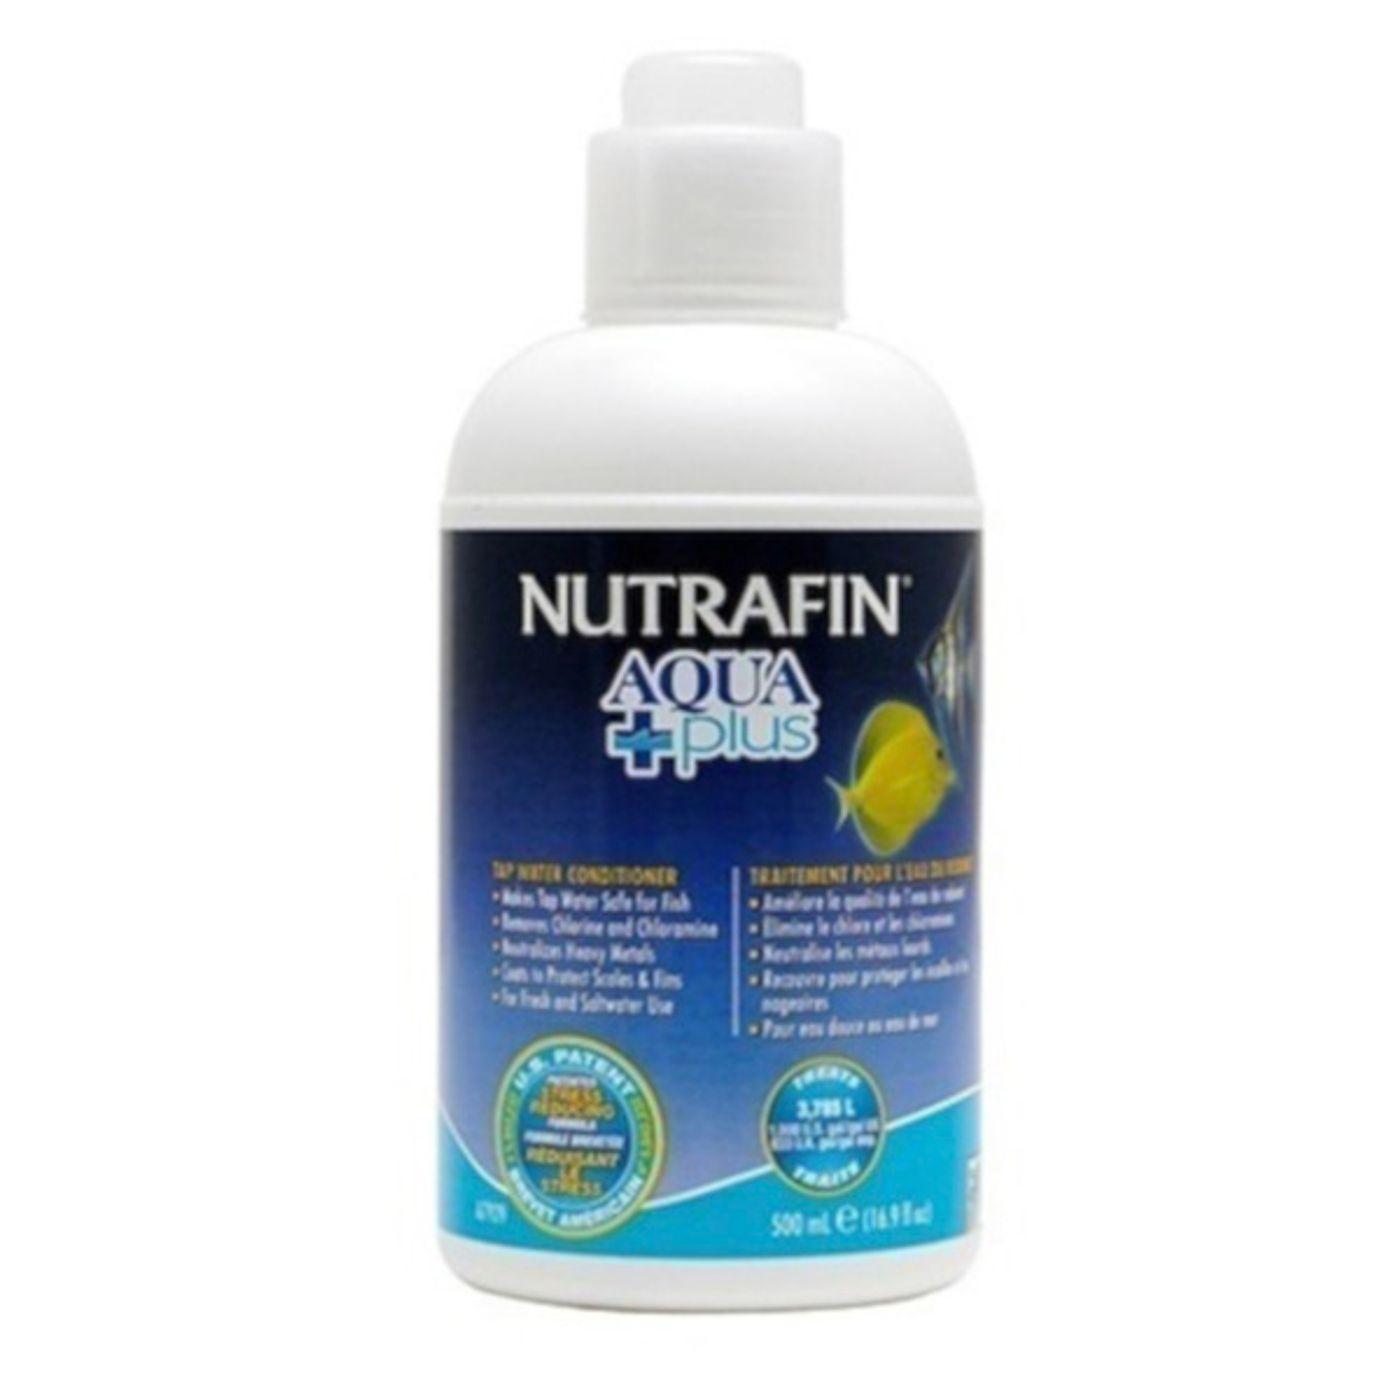 NUTRAFIN-Acondicionador-Aqua-Plus--500ml-